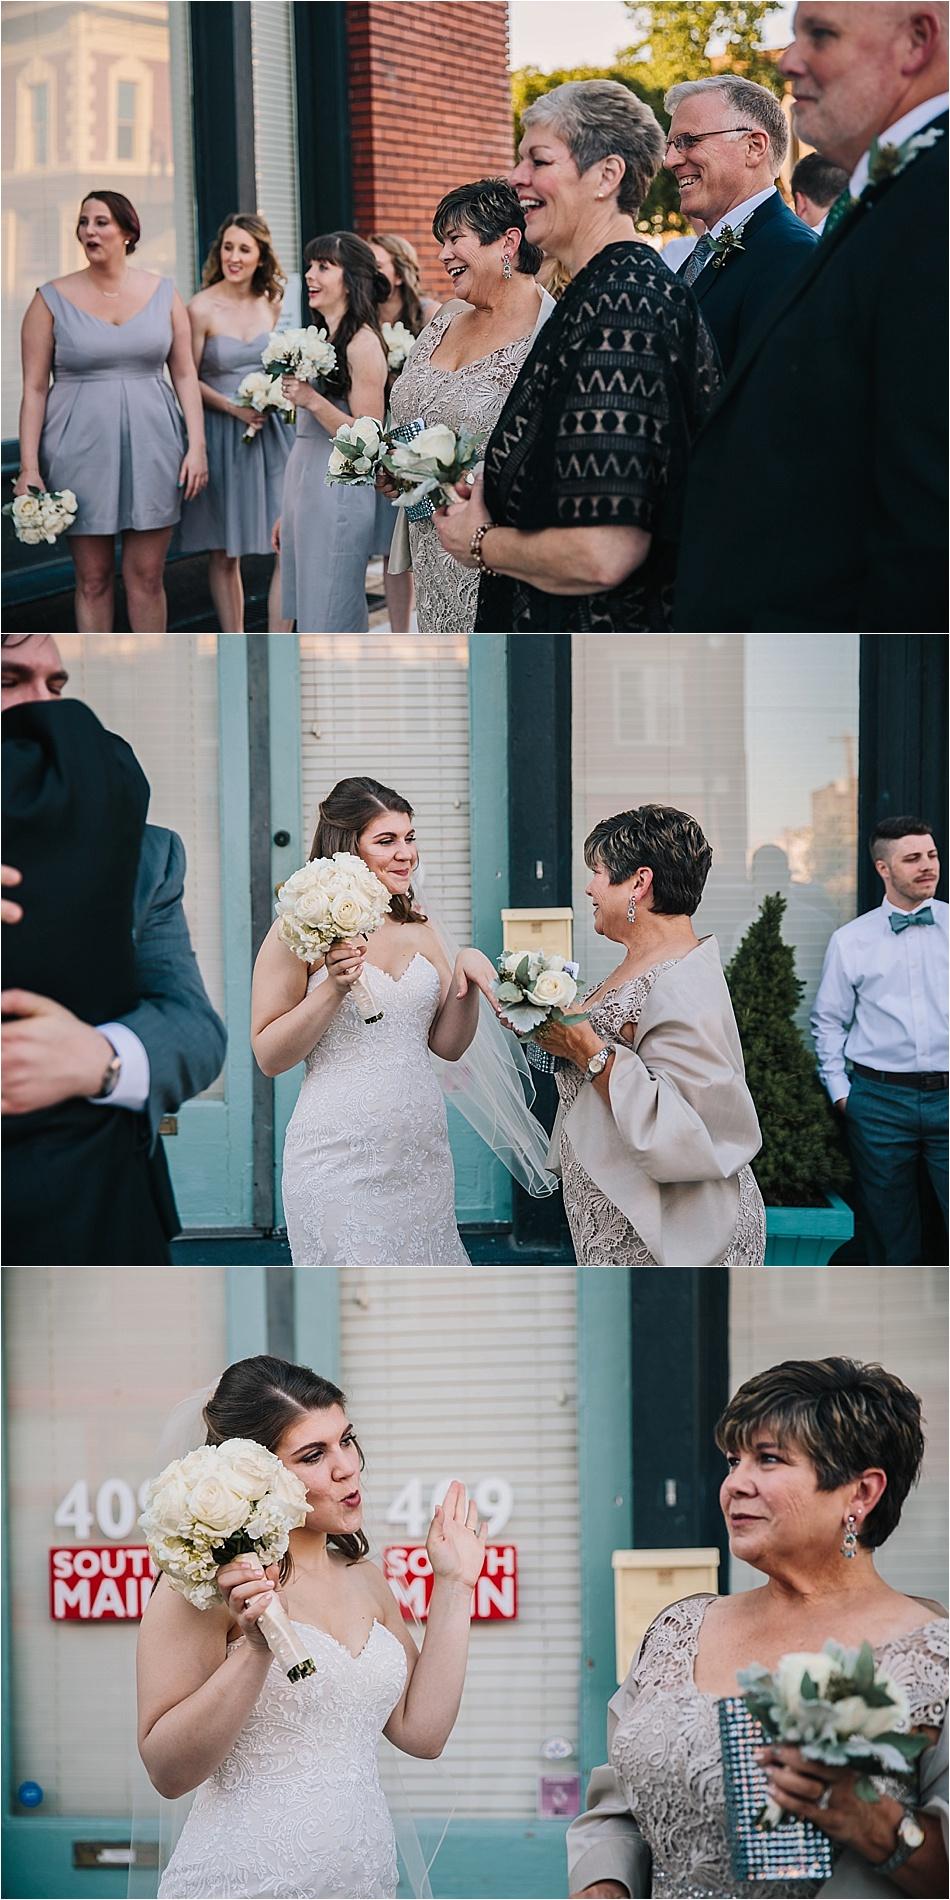 CK-Photo-Nashville-Wedding-Photographer-_0029.jpg